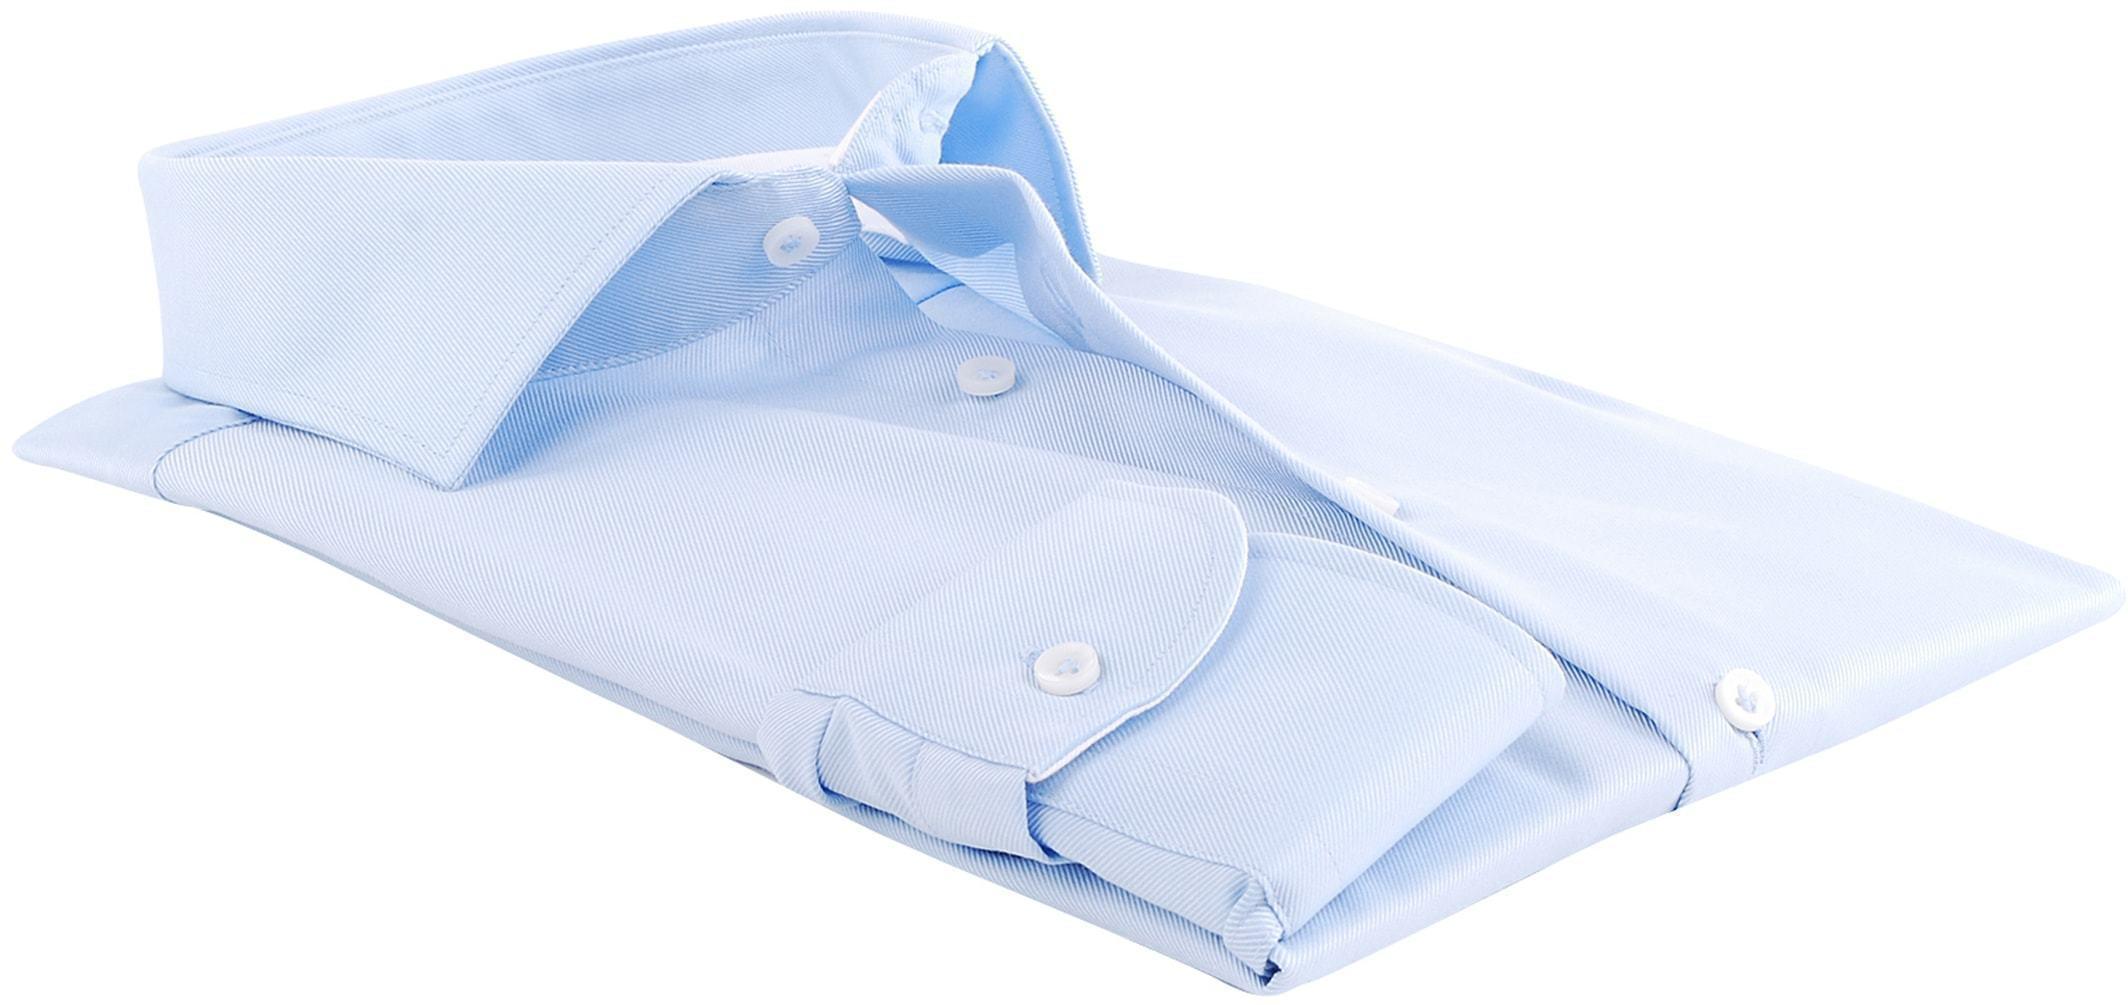 Profuomo shirt Blue + White Contrast foto 1